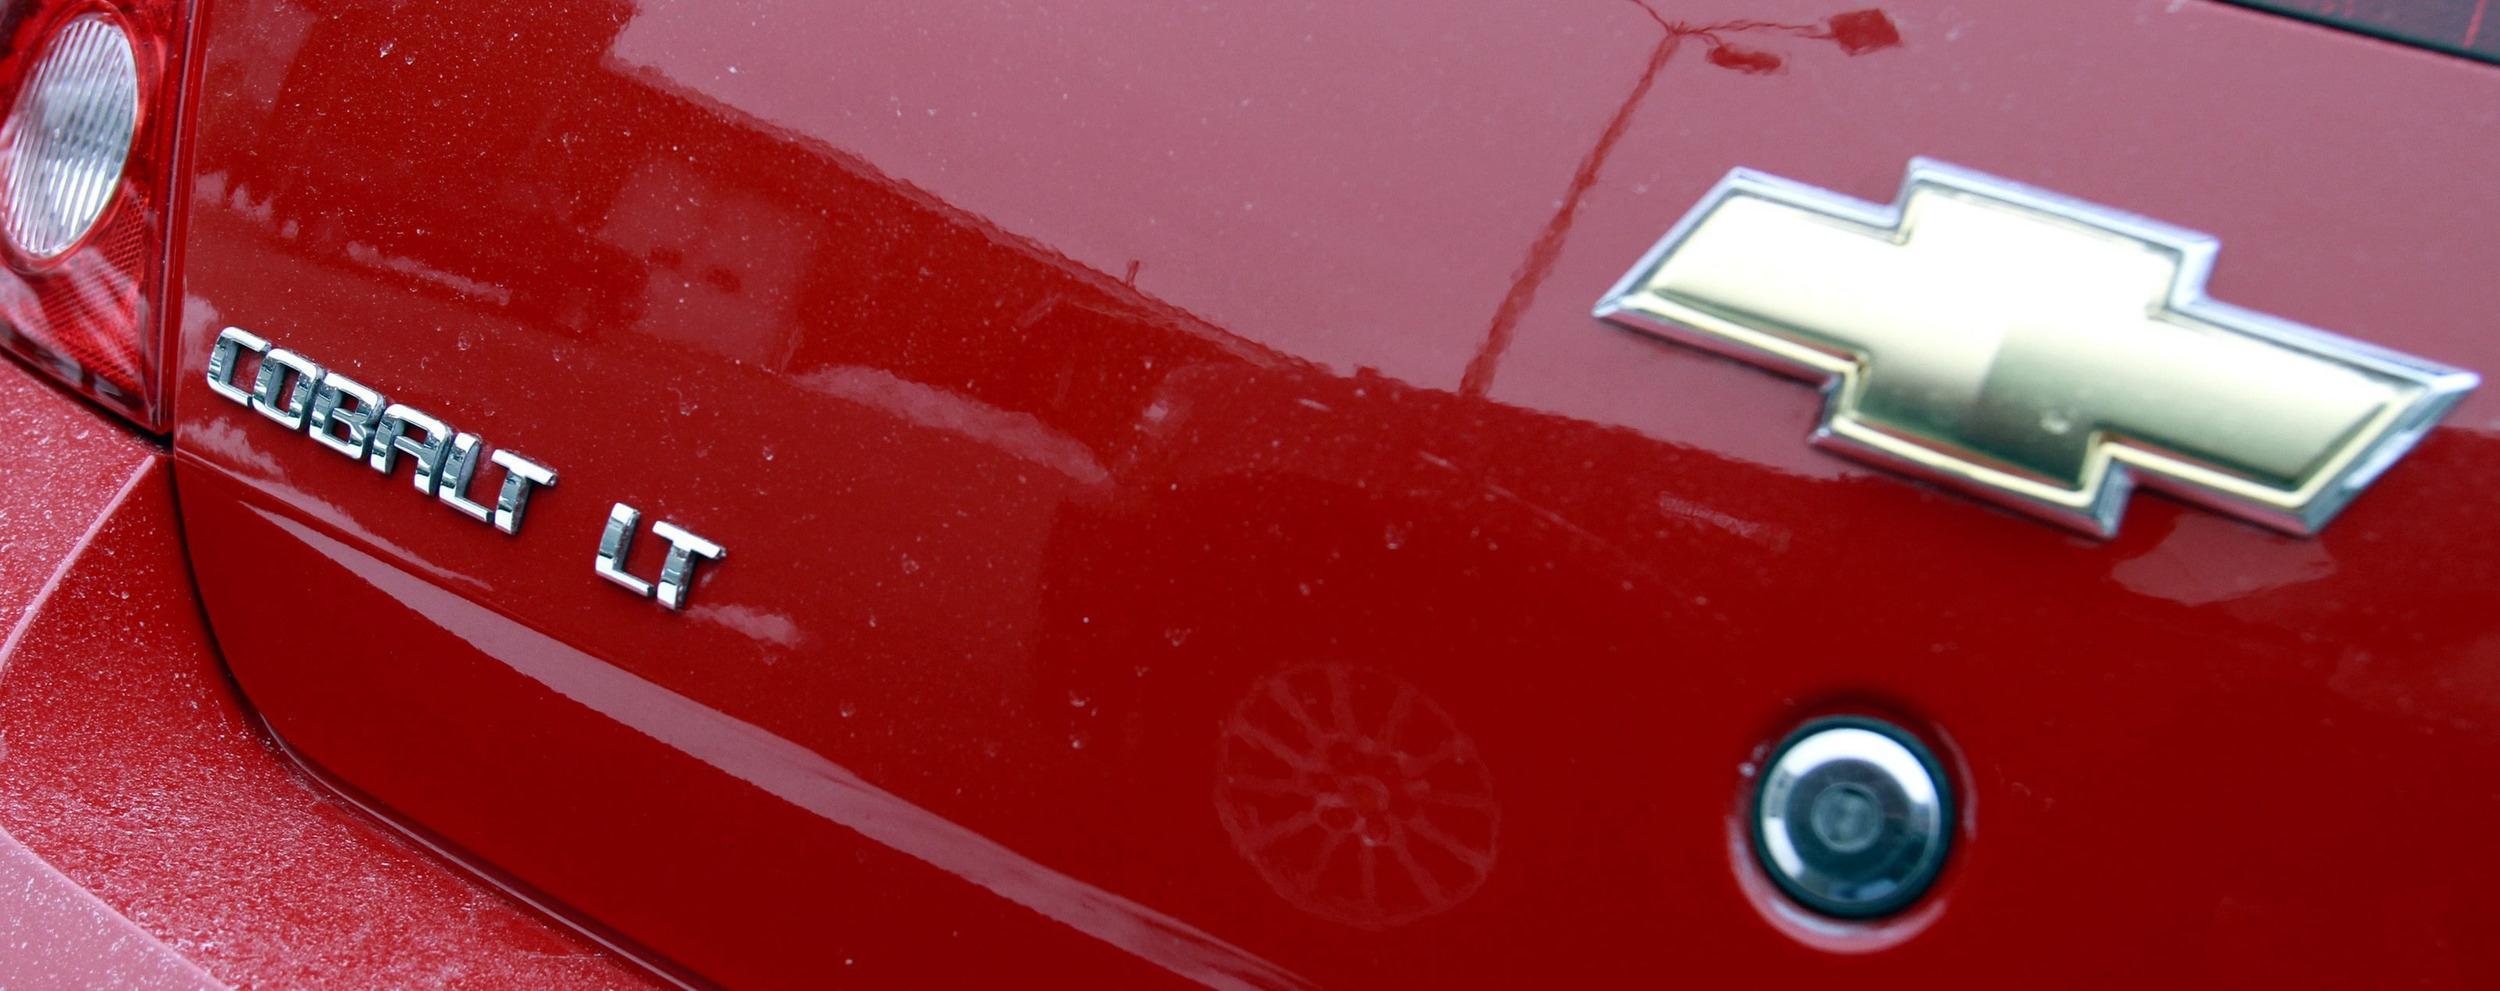 GM recalls Chevrolet Cobalt and Pontiac G5 compact cars because of an ignition problem